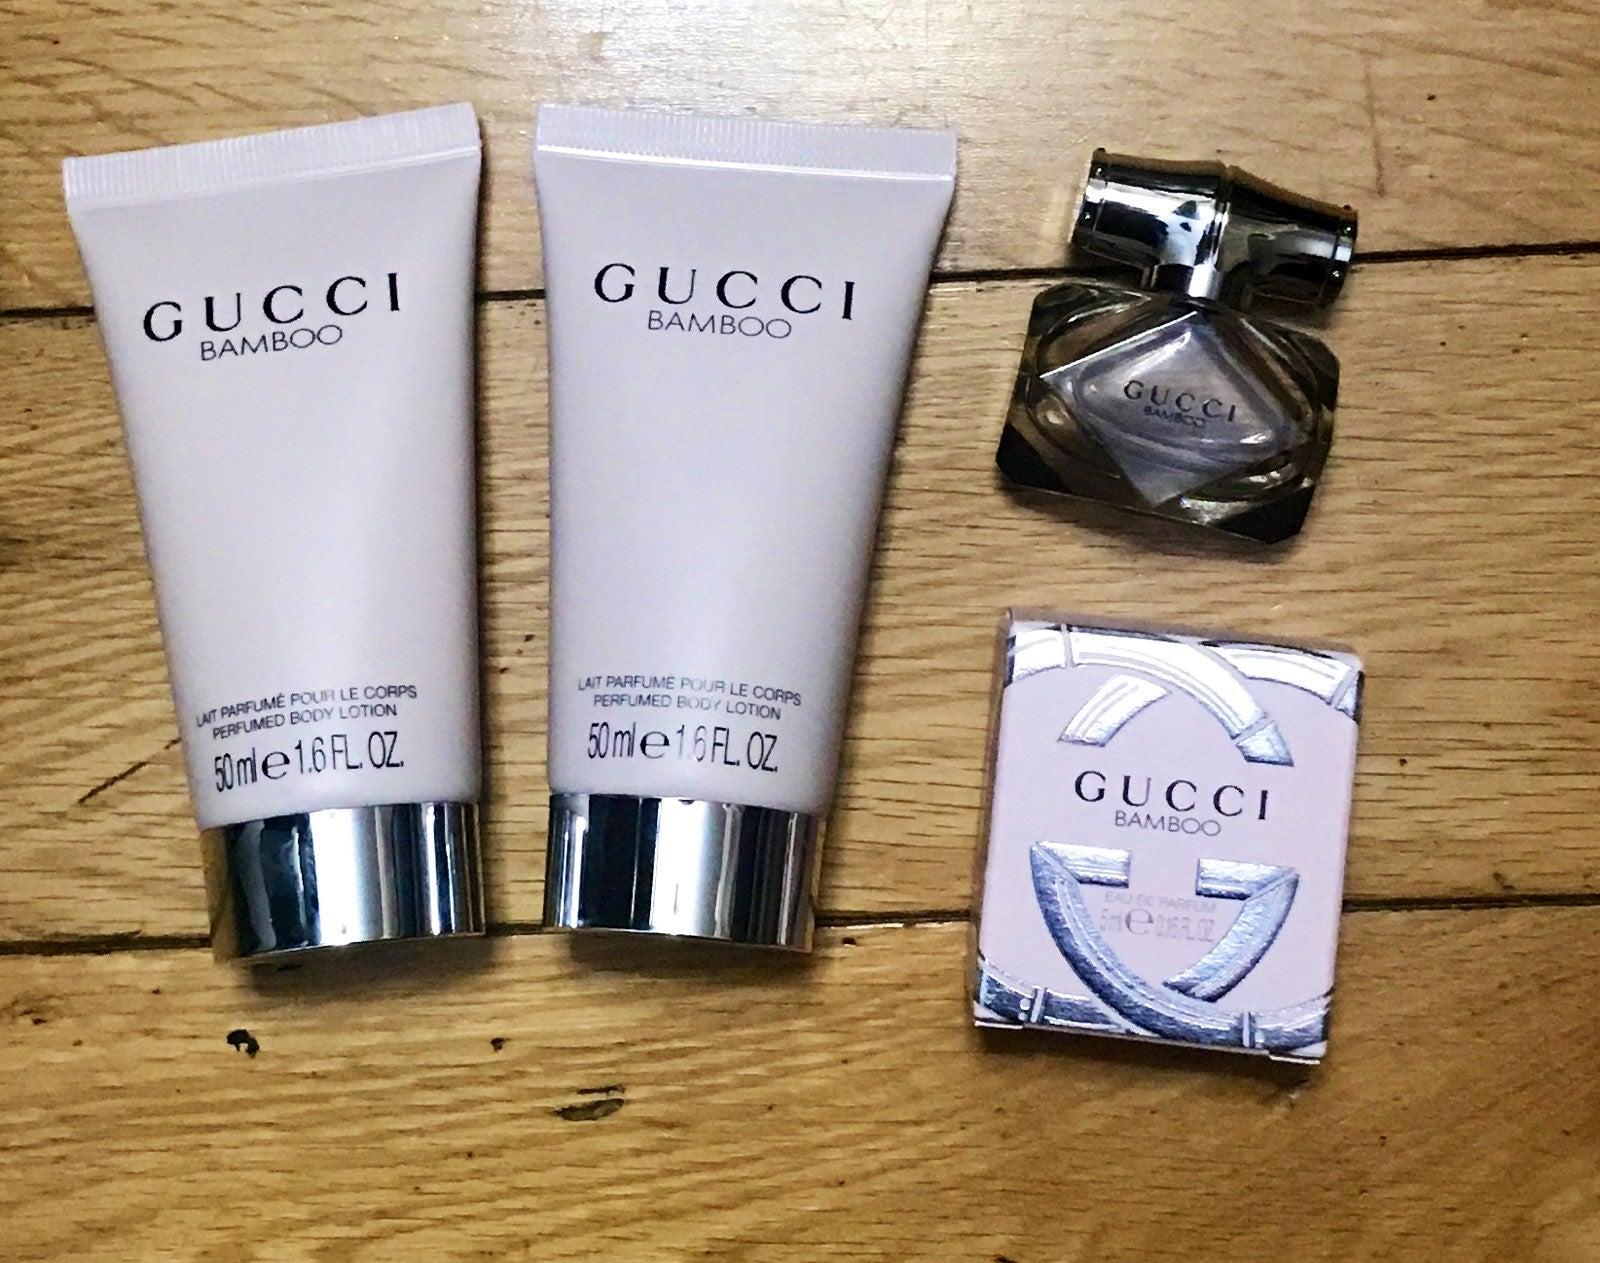 Gucci Bamboo bundle